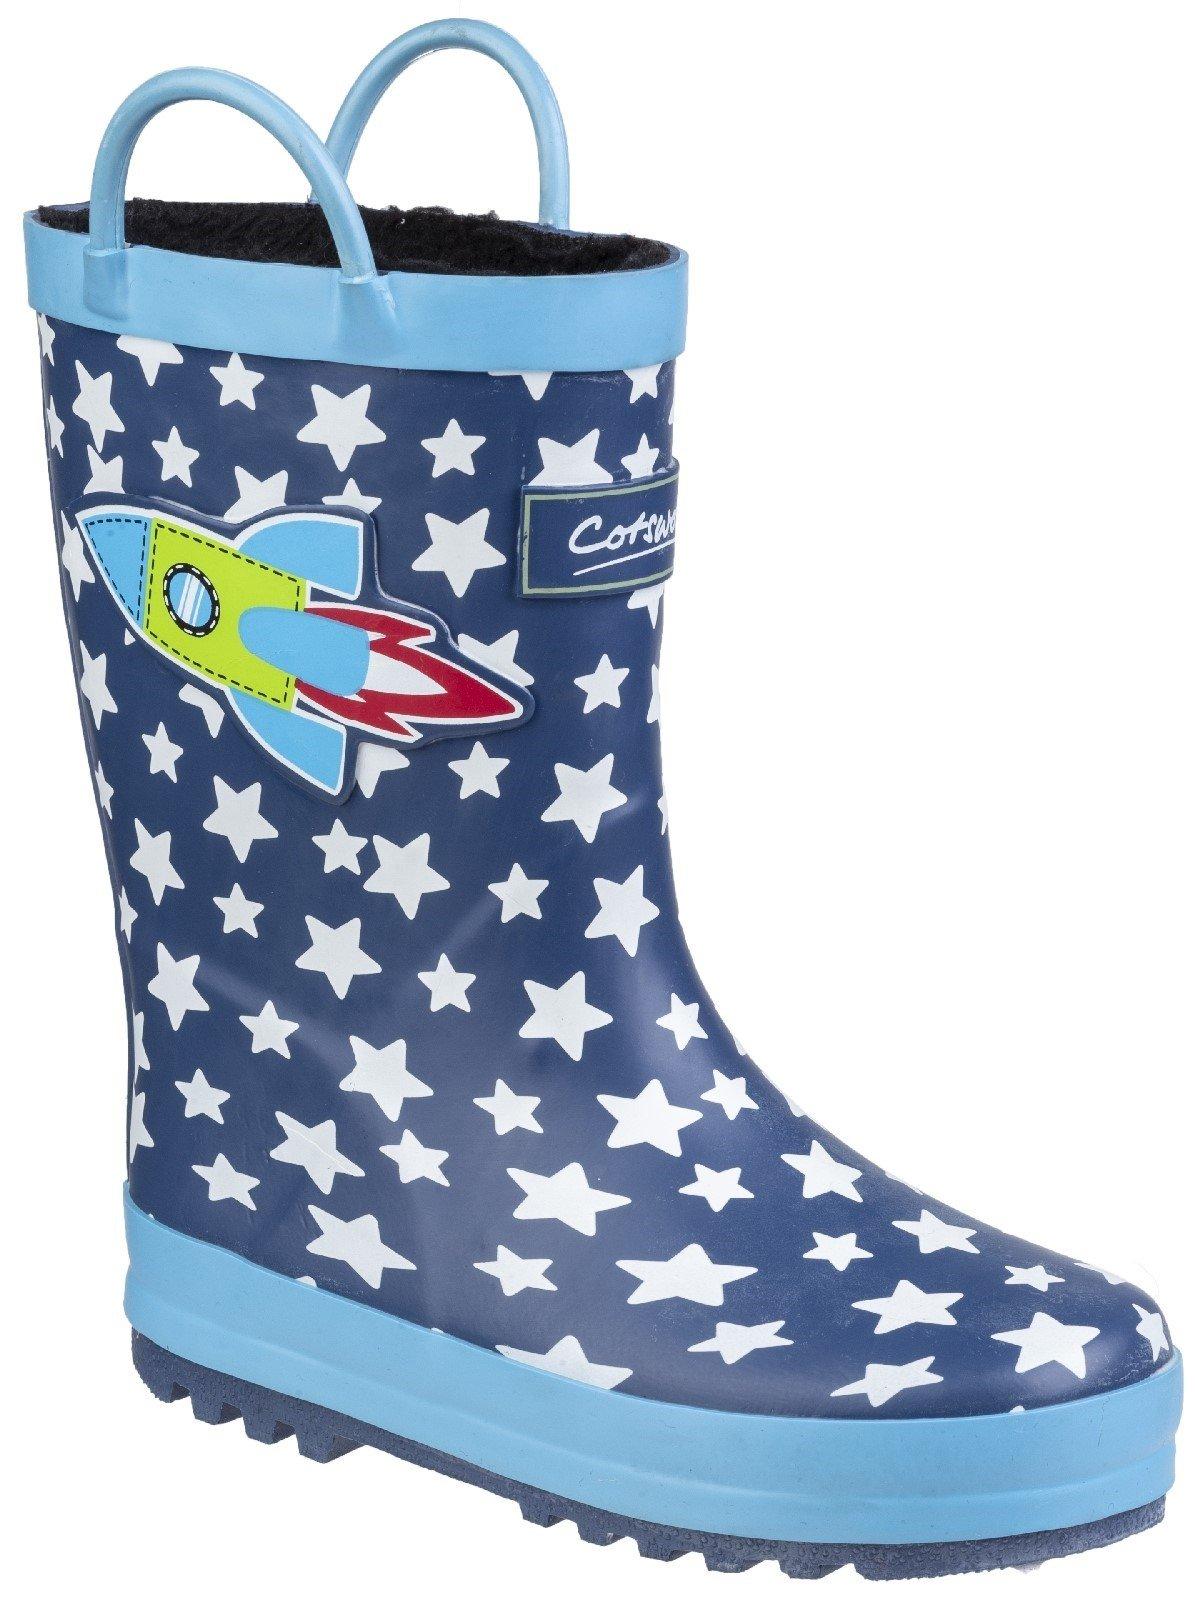 Cotswold Kids Sprinkle Junior Wellington Boot 27178 - Dark Blue & White 6